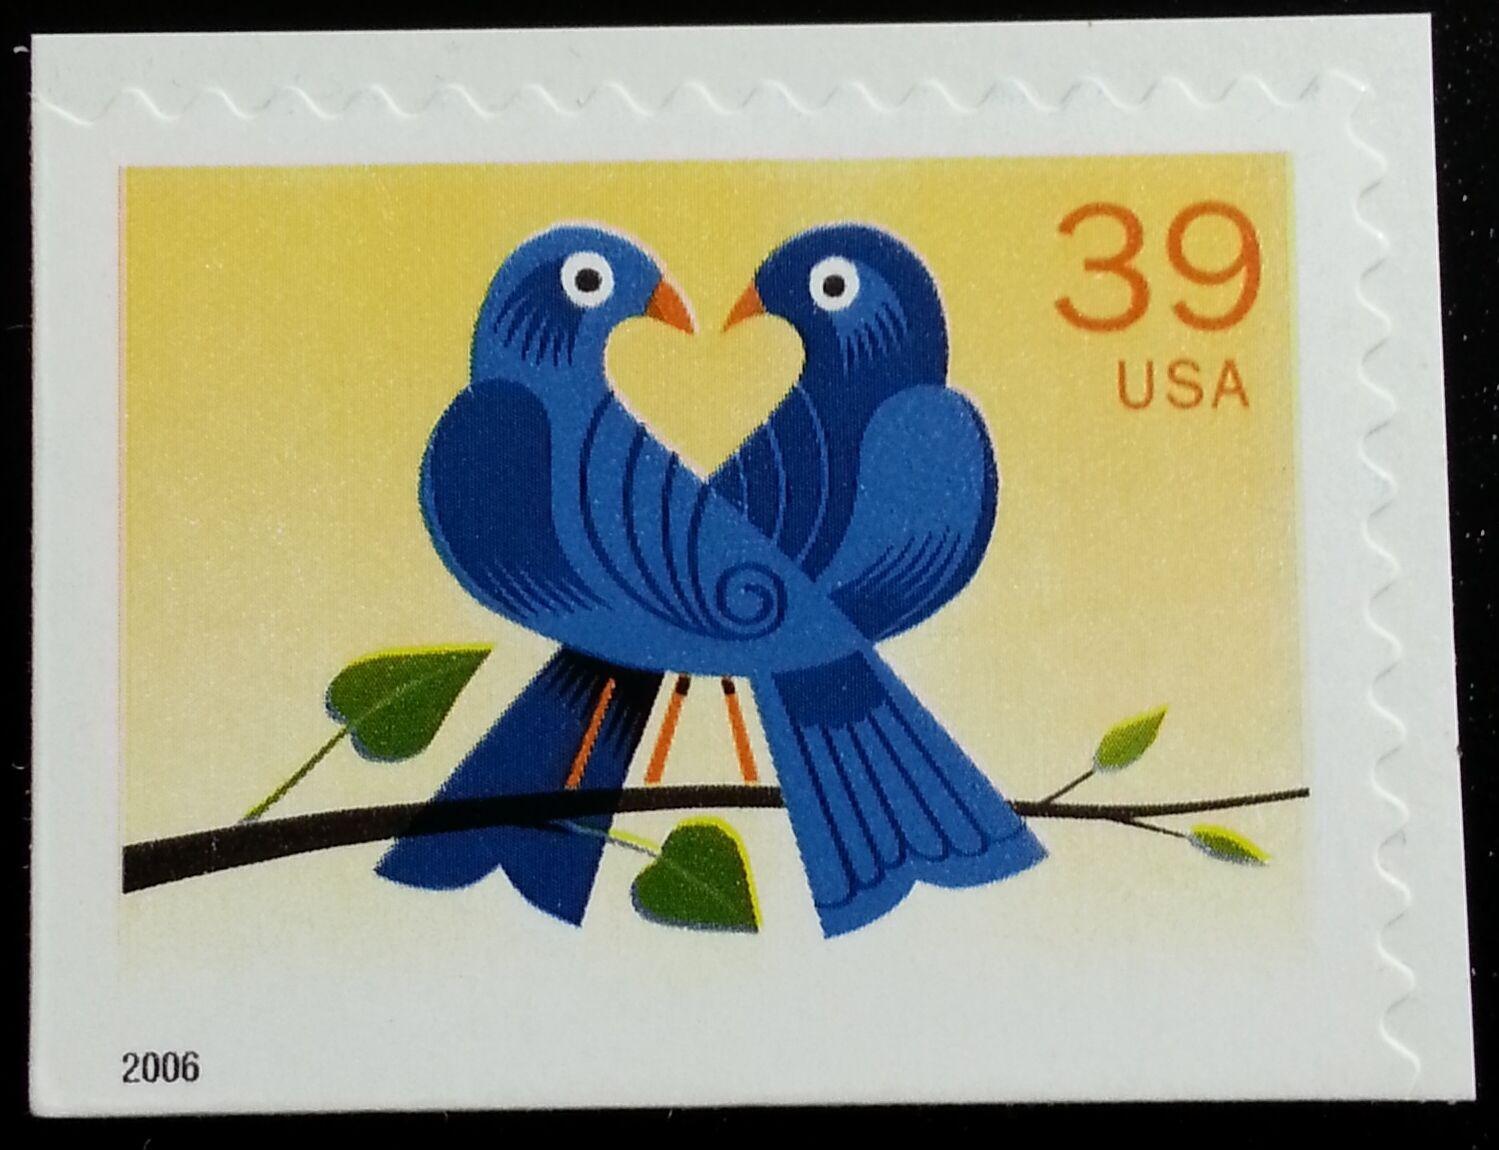 2006 39c Love, Birds, Booklet Single Scott 4029 Mint F/